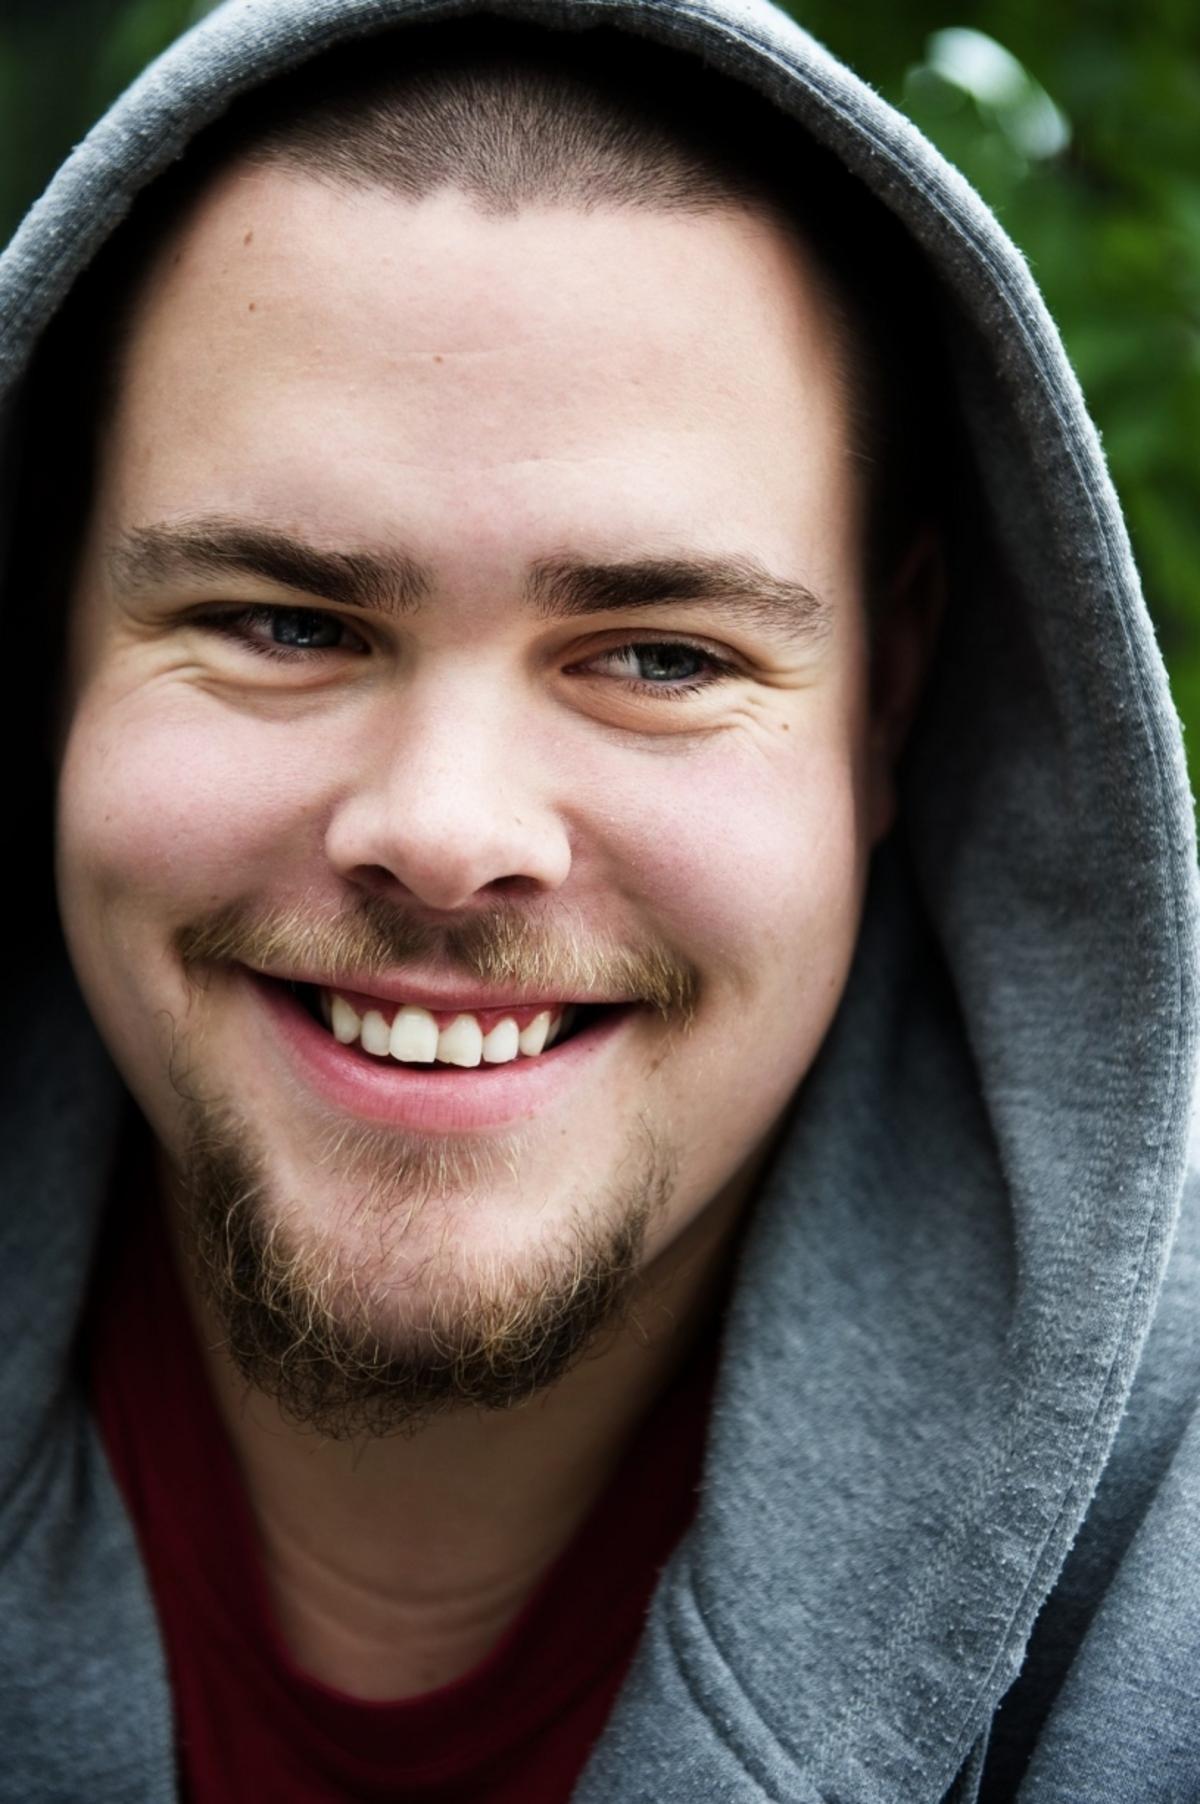 Mats Forslund, Finngrdet 16, Sundborn | satisfaction-survey.net